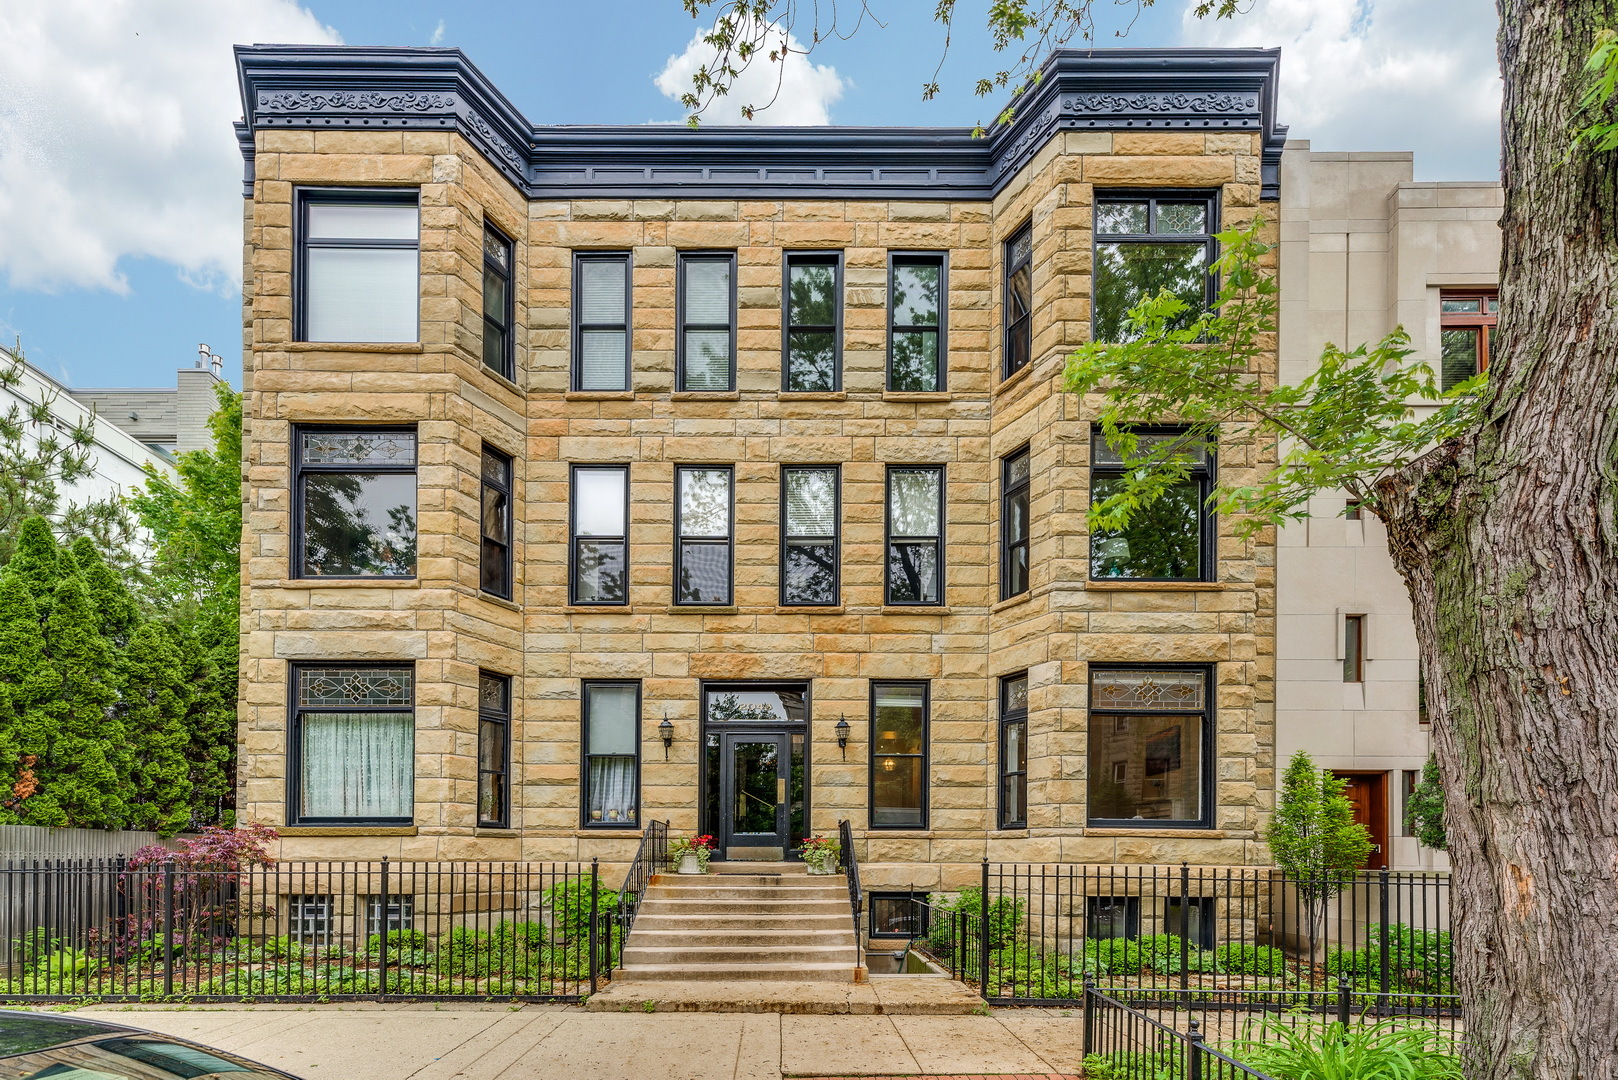 2043 N Mohawk Street 1S, Chicago, Illinois 60614